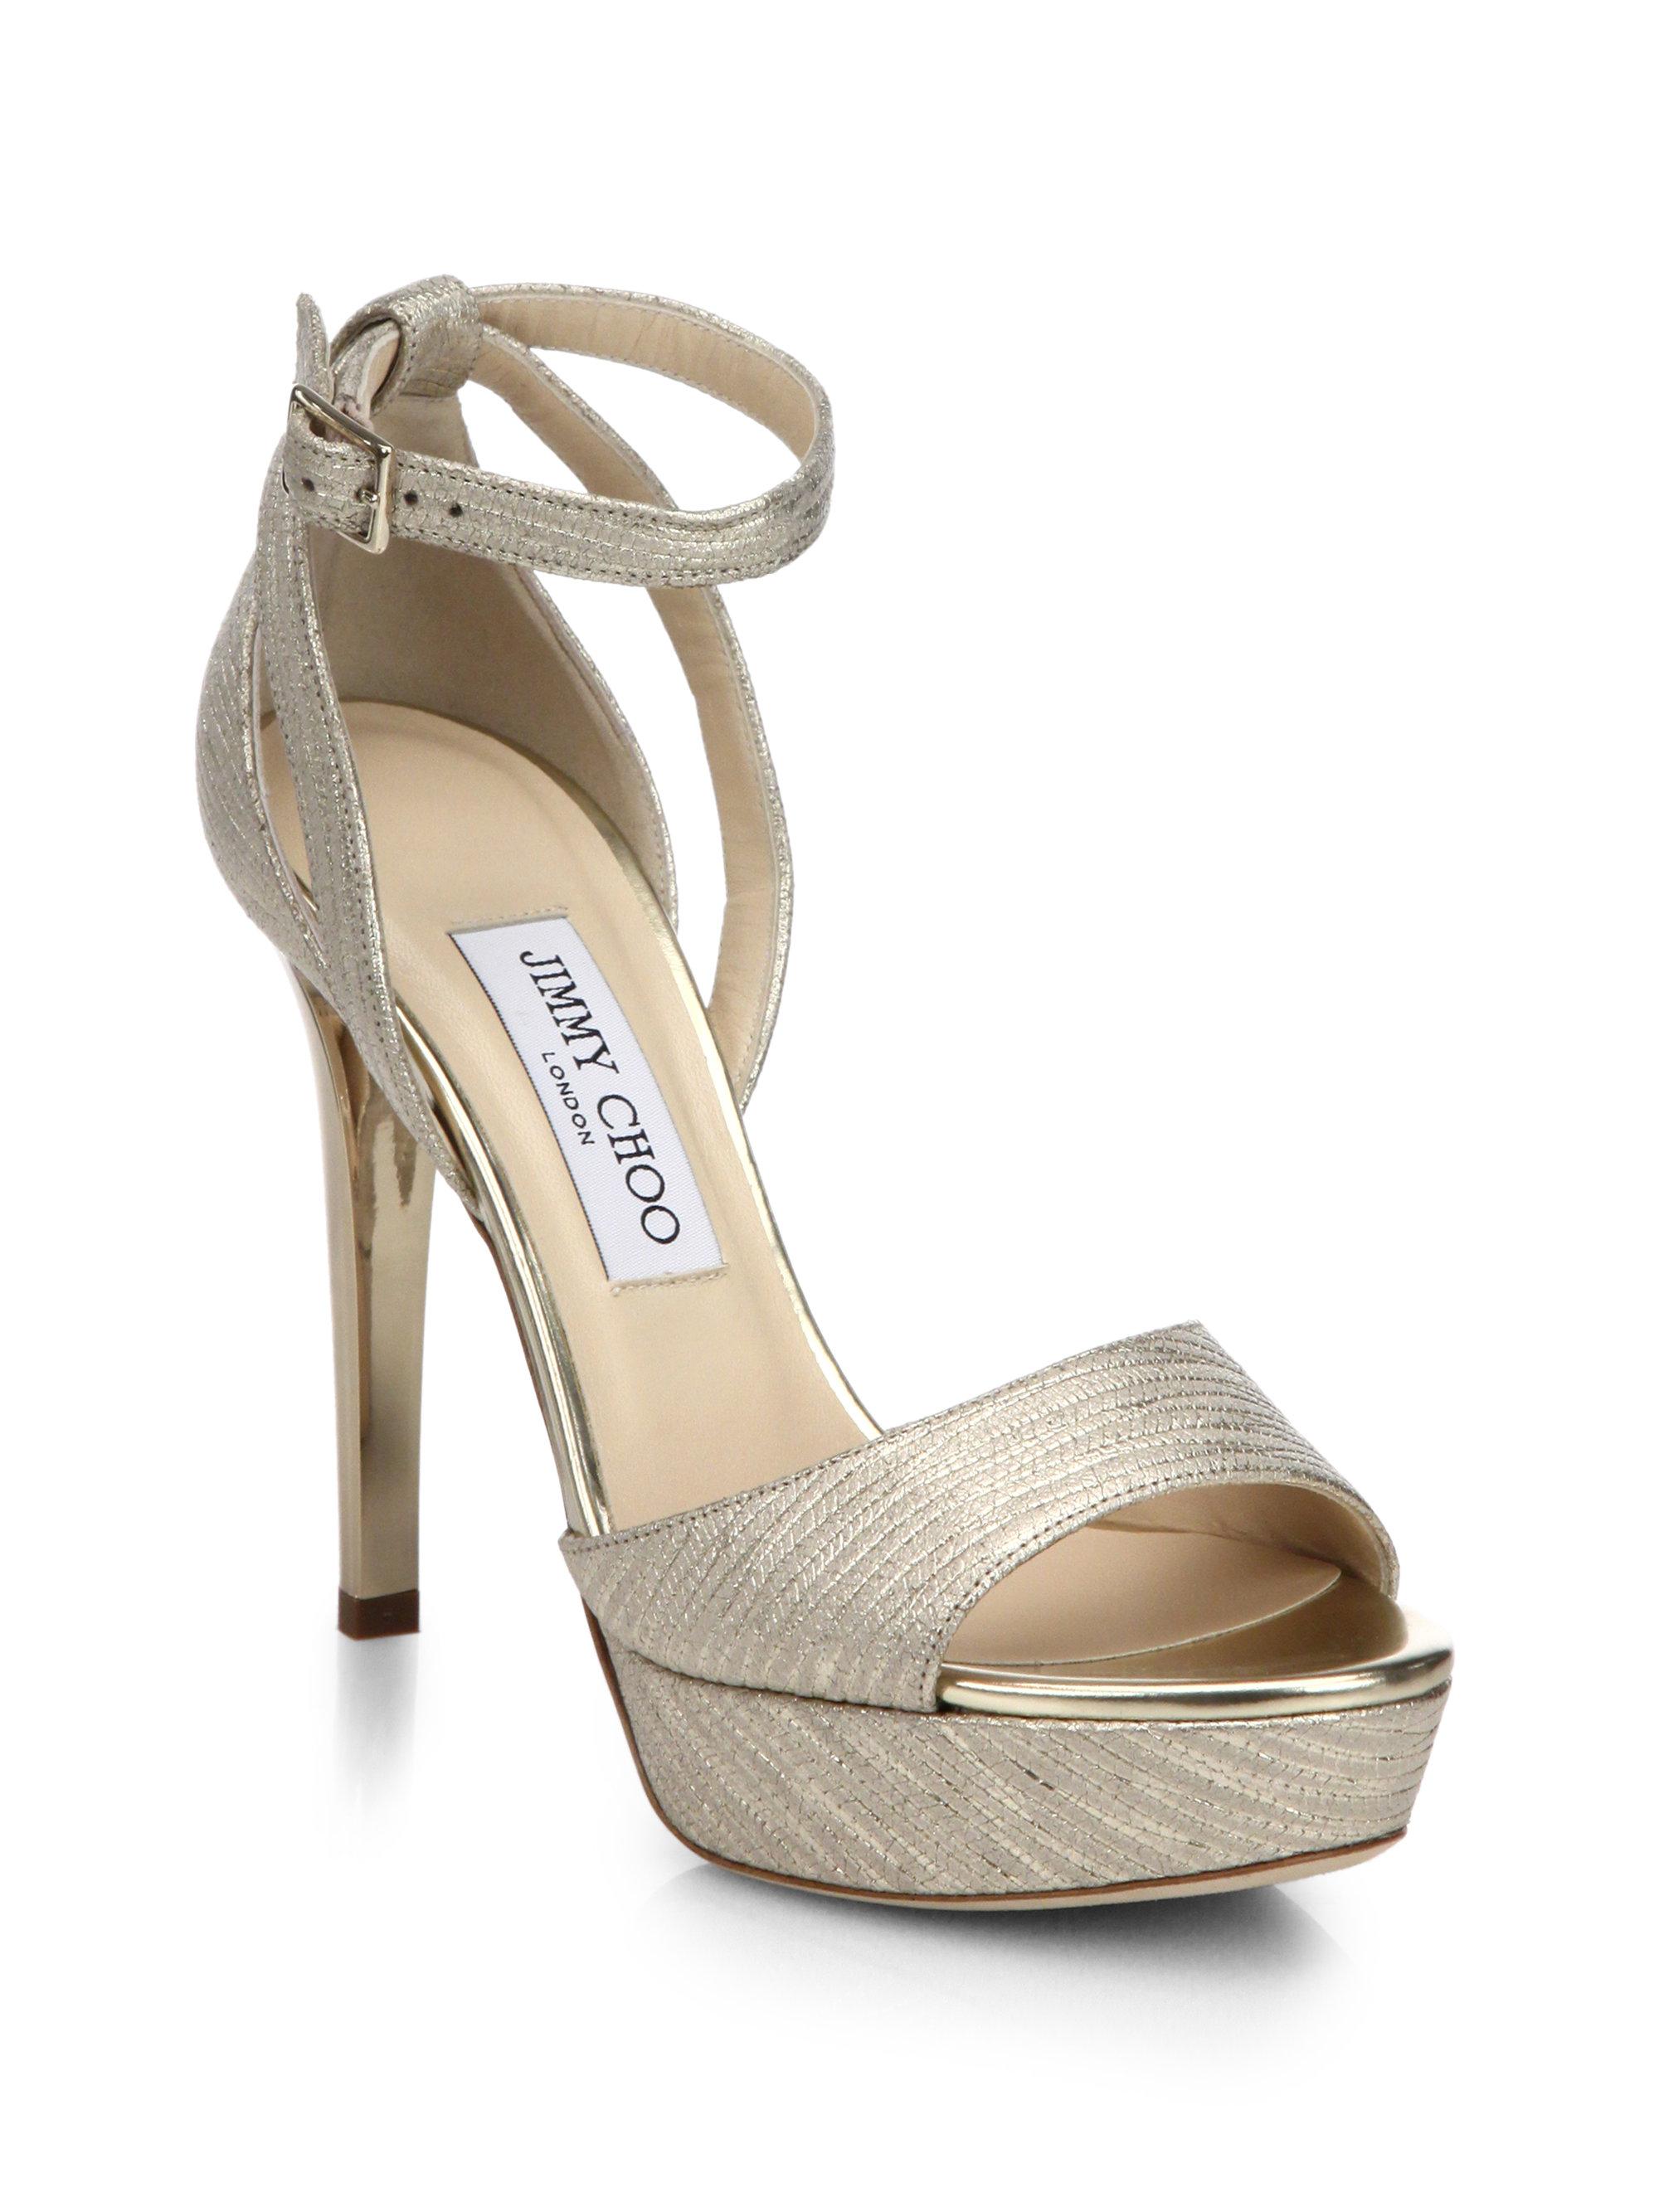 Jimmy Choo Gold Sandals